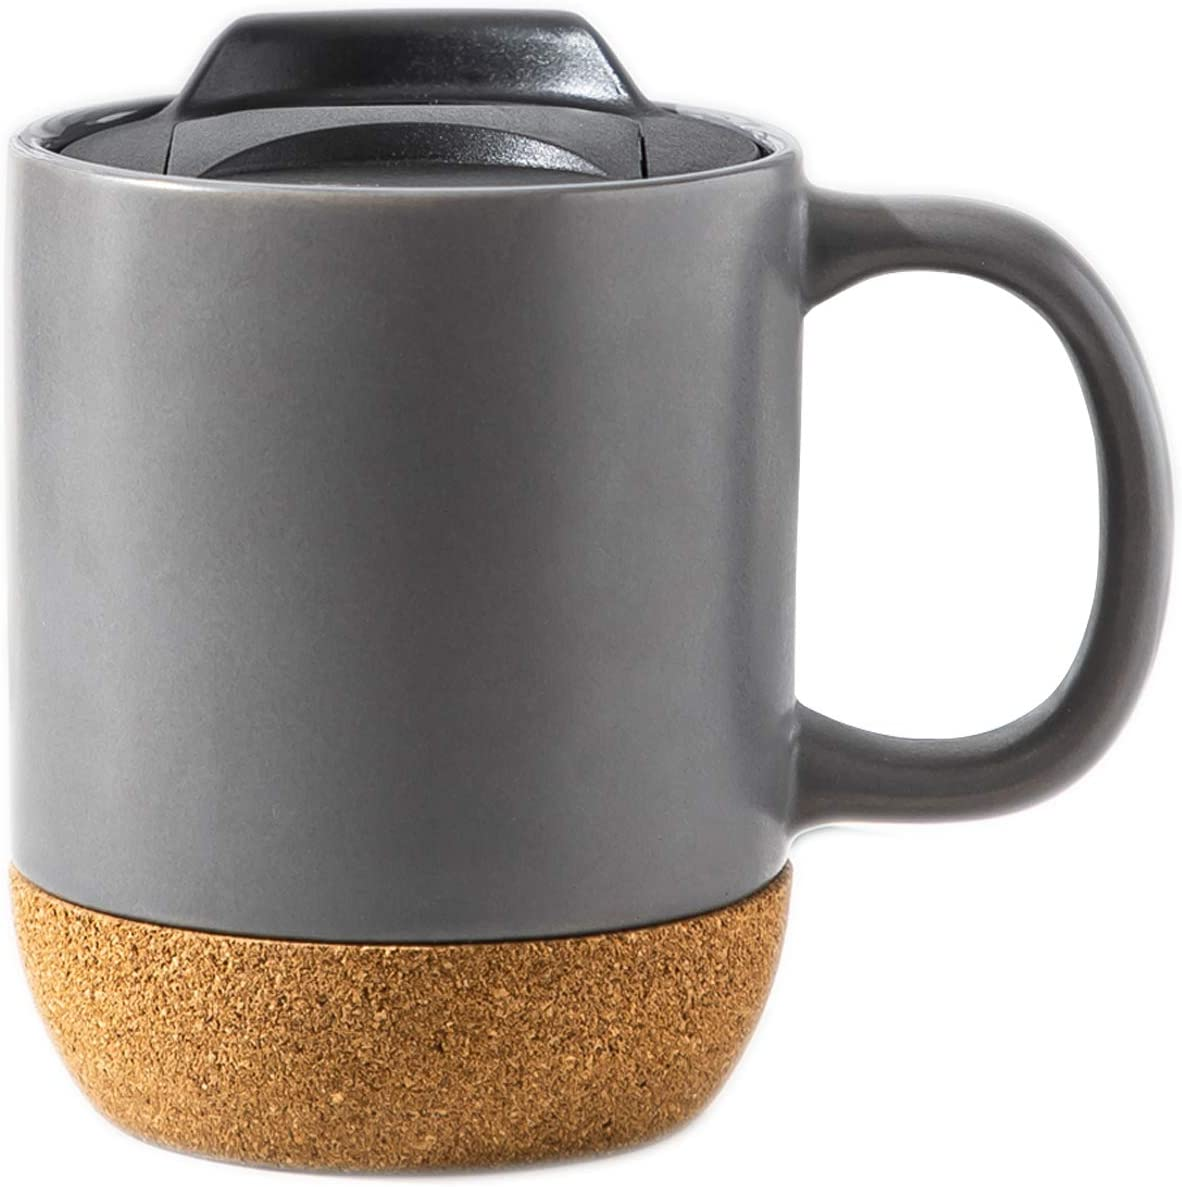 Anti Spill 12 Oz Travel Coffee Mug with Handle Matte Black Ceramic Coffee Mug Cup Tea Cup with Insulated Cork Bottom Matte Ceramic Travel Mug